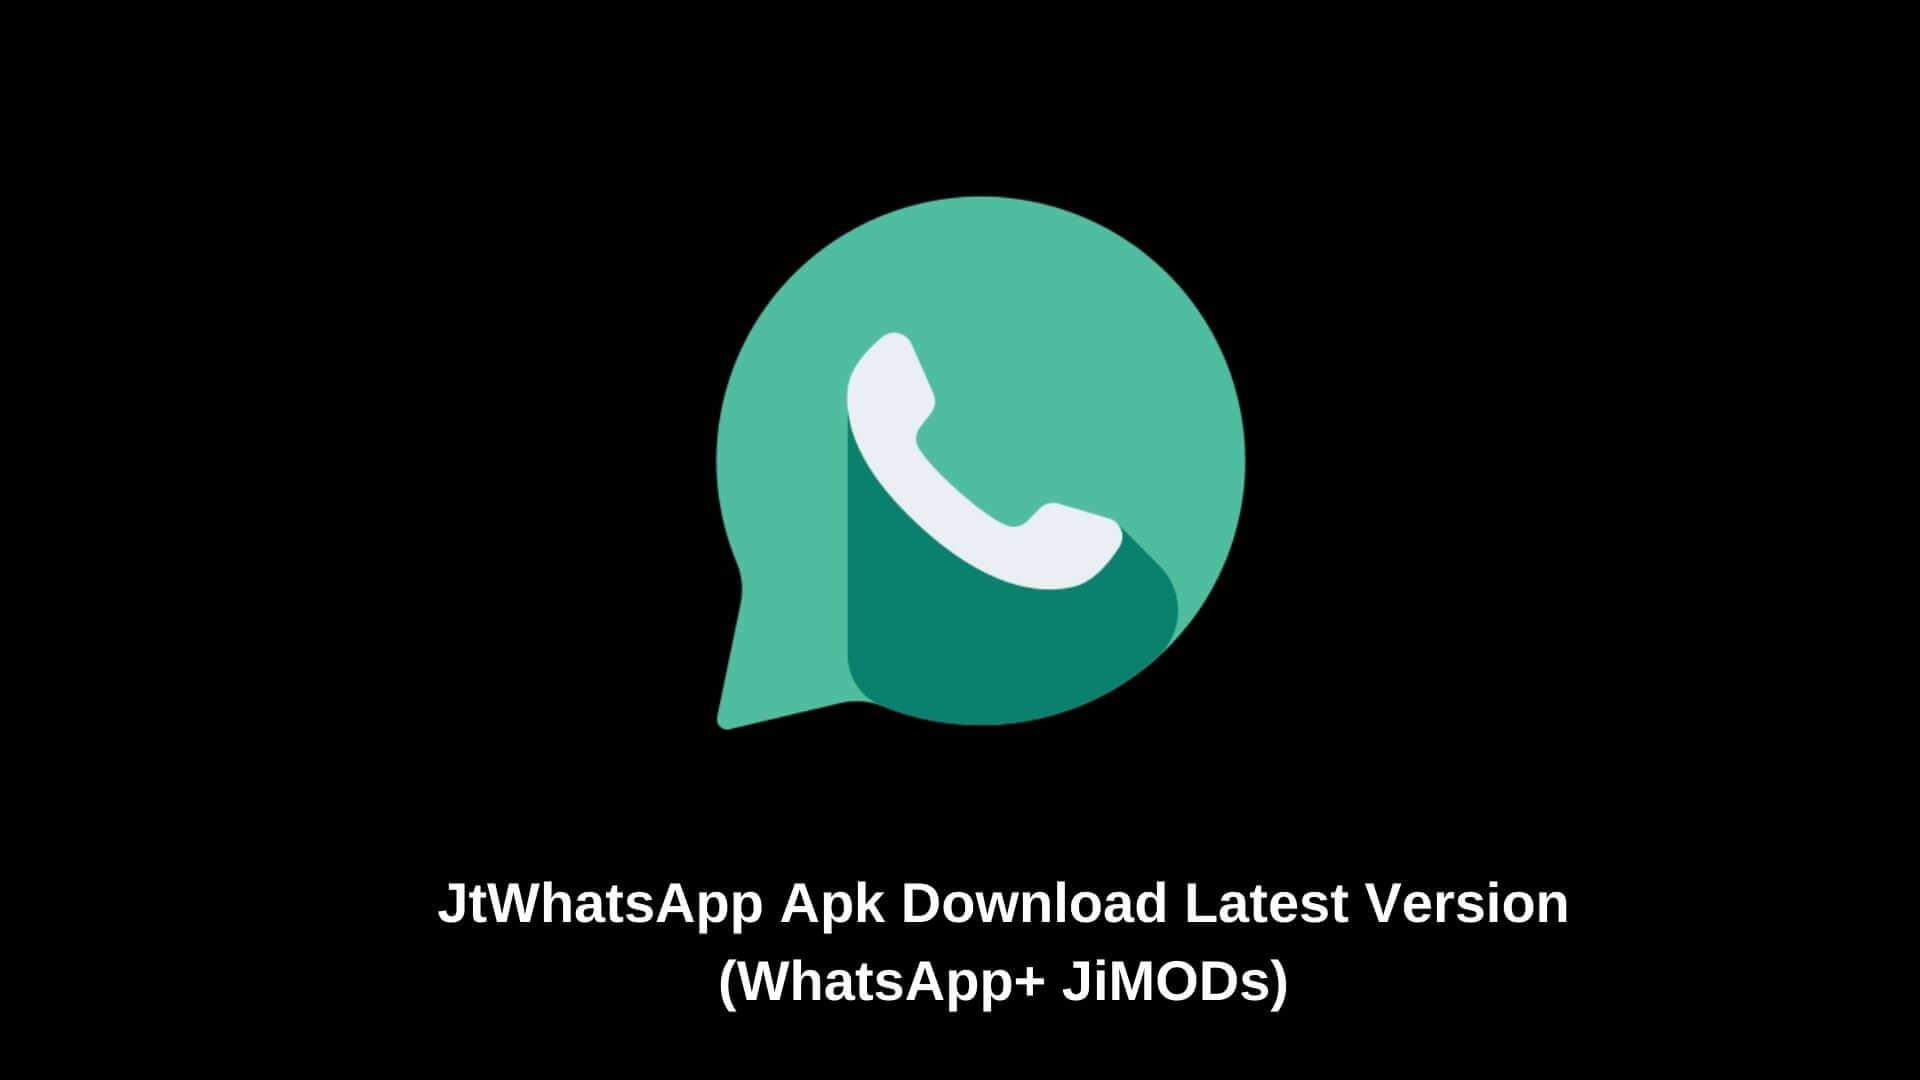 WhatsApp+ JiMODs JTWhatsApp